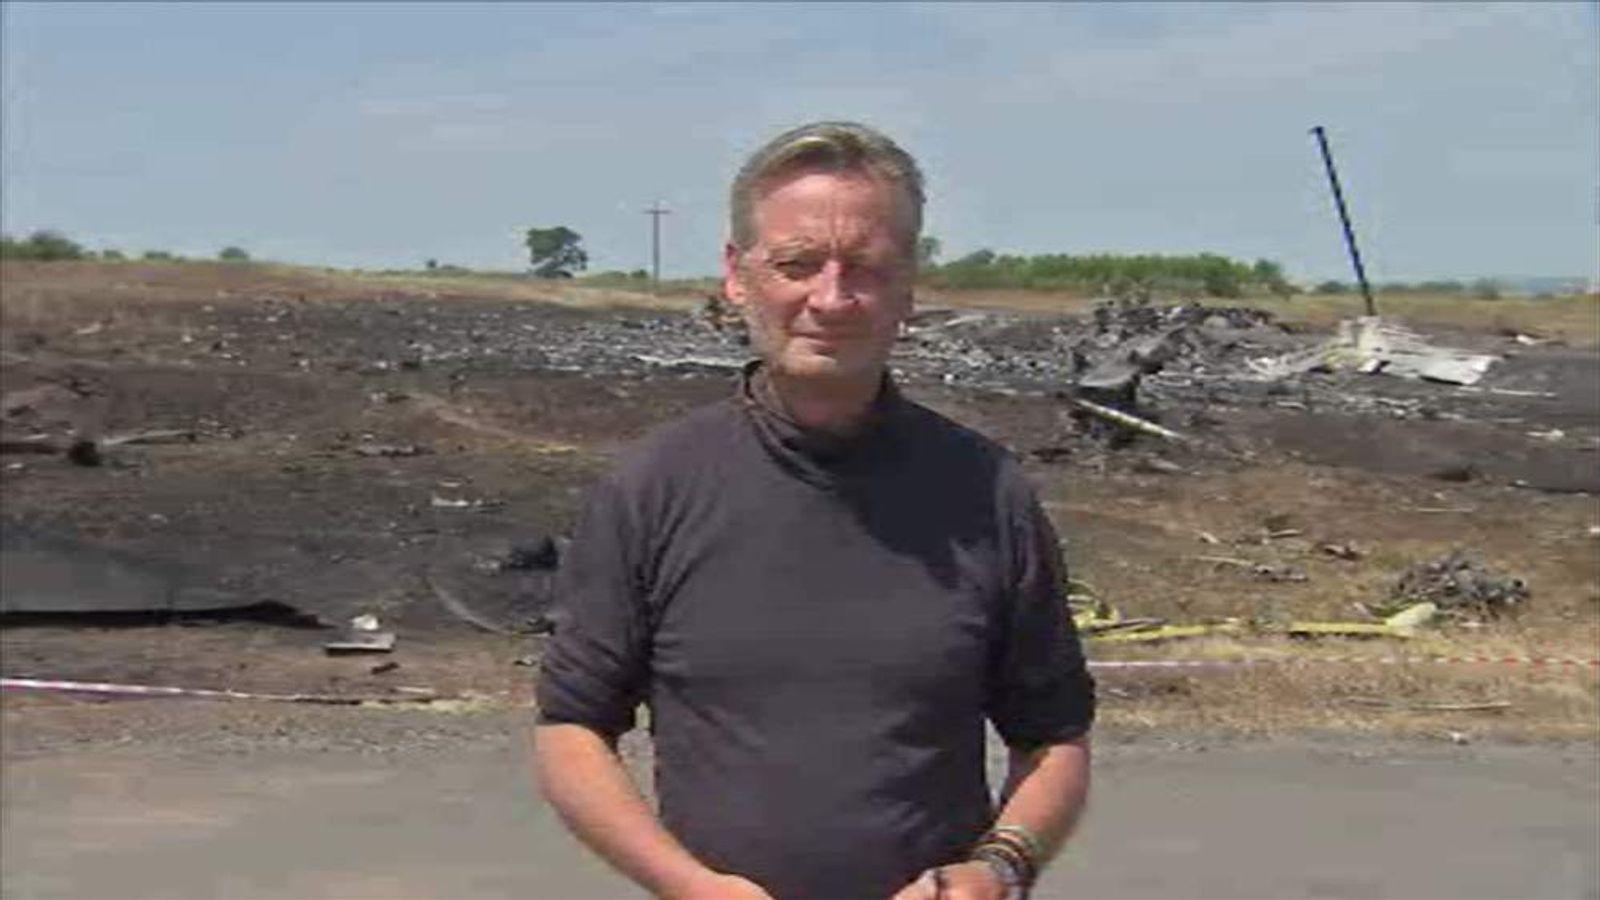 Stuart Ramsay at MH17 crash site